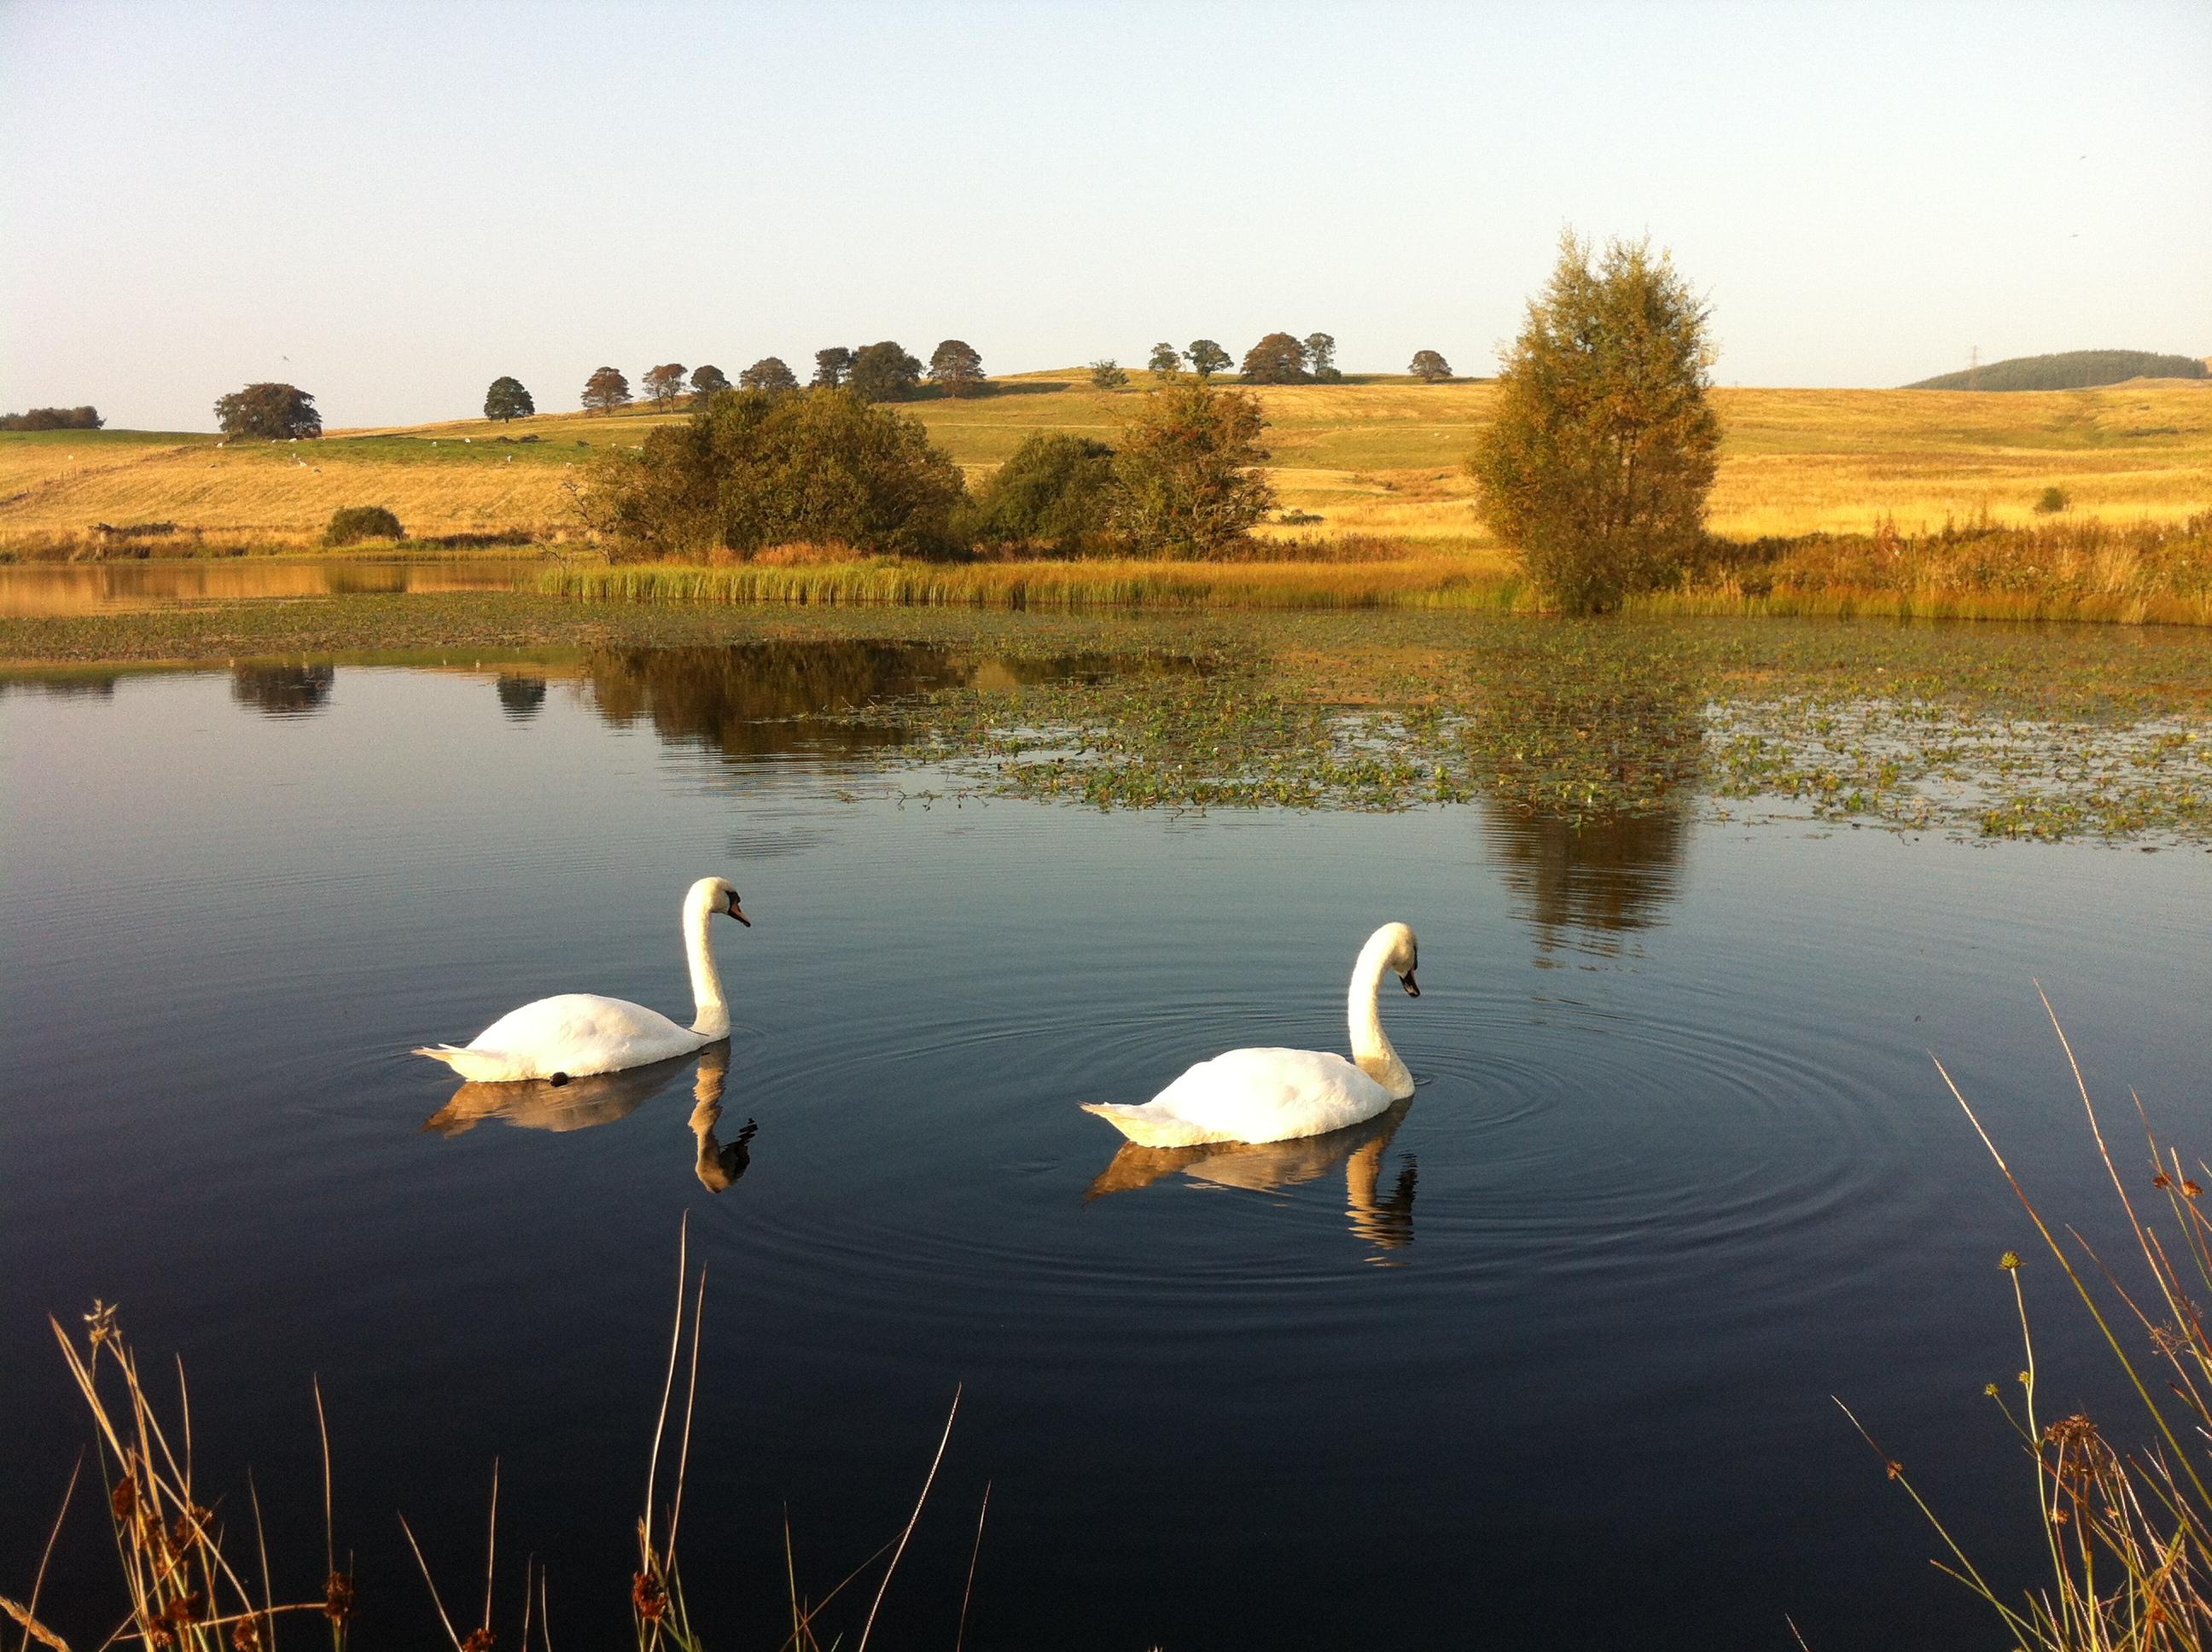 Four swans